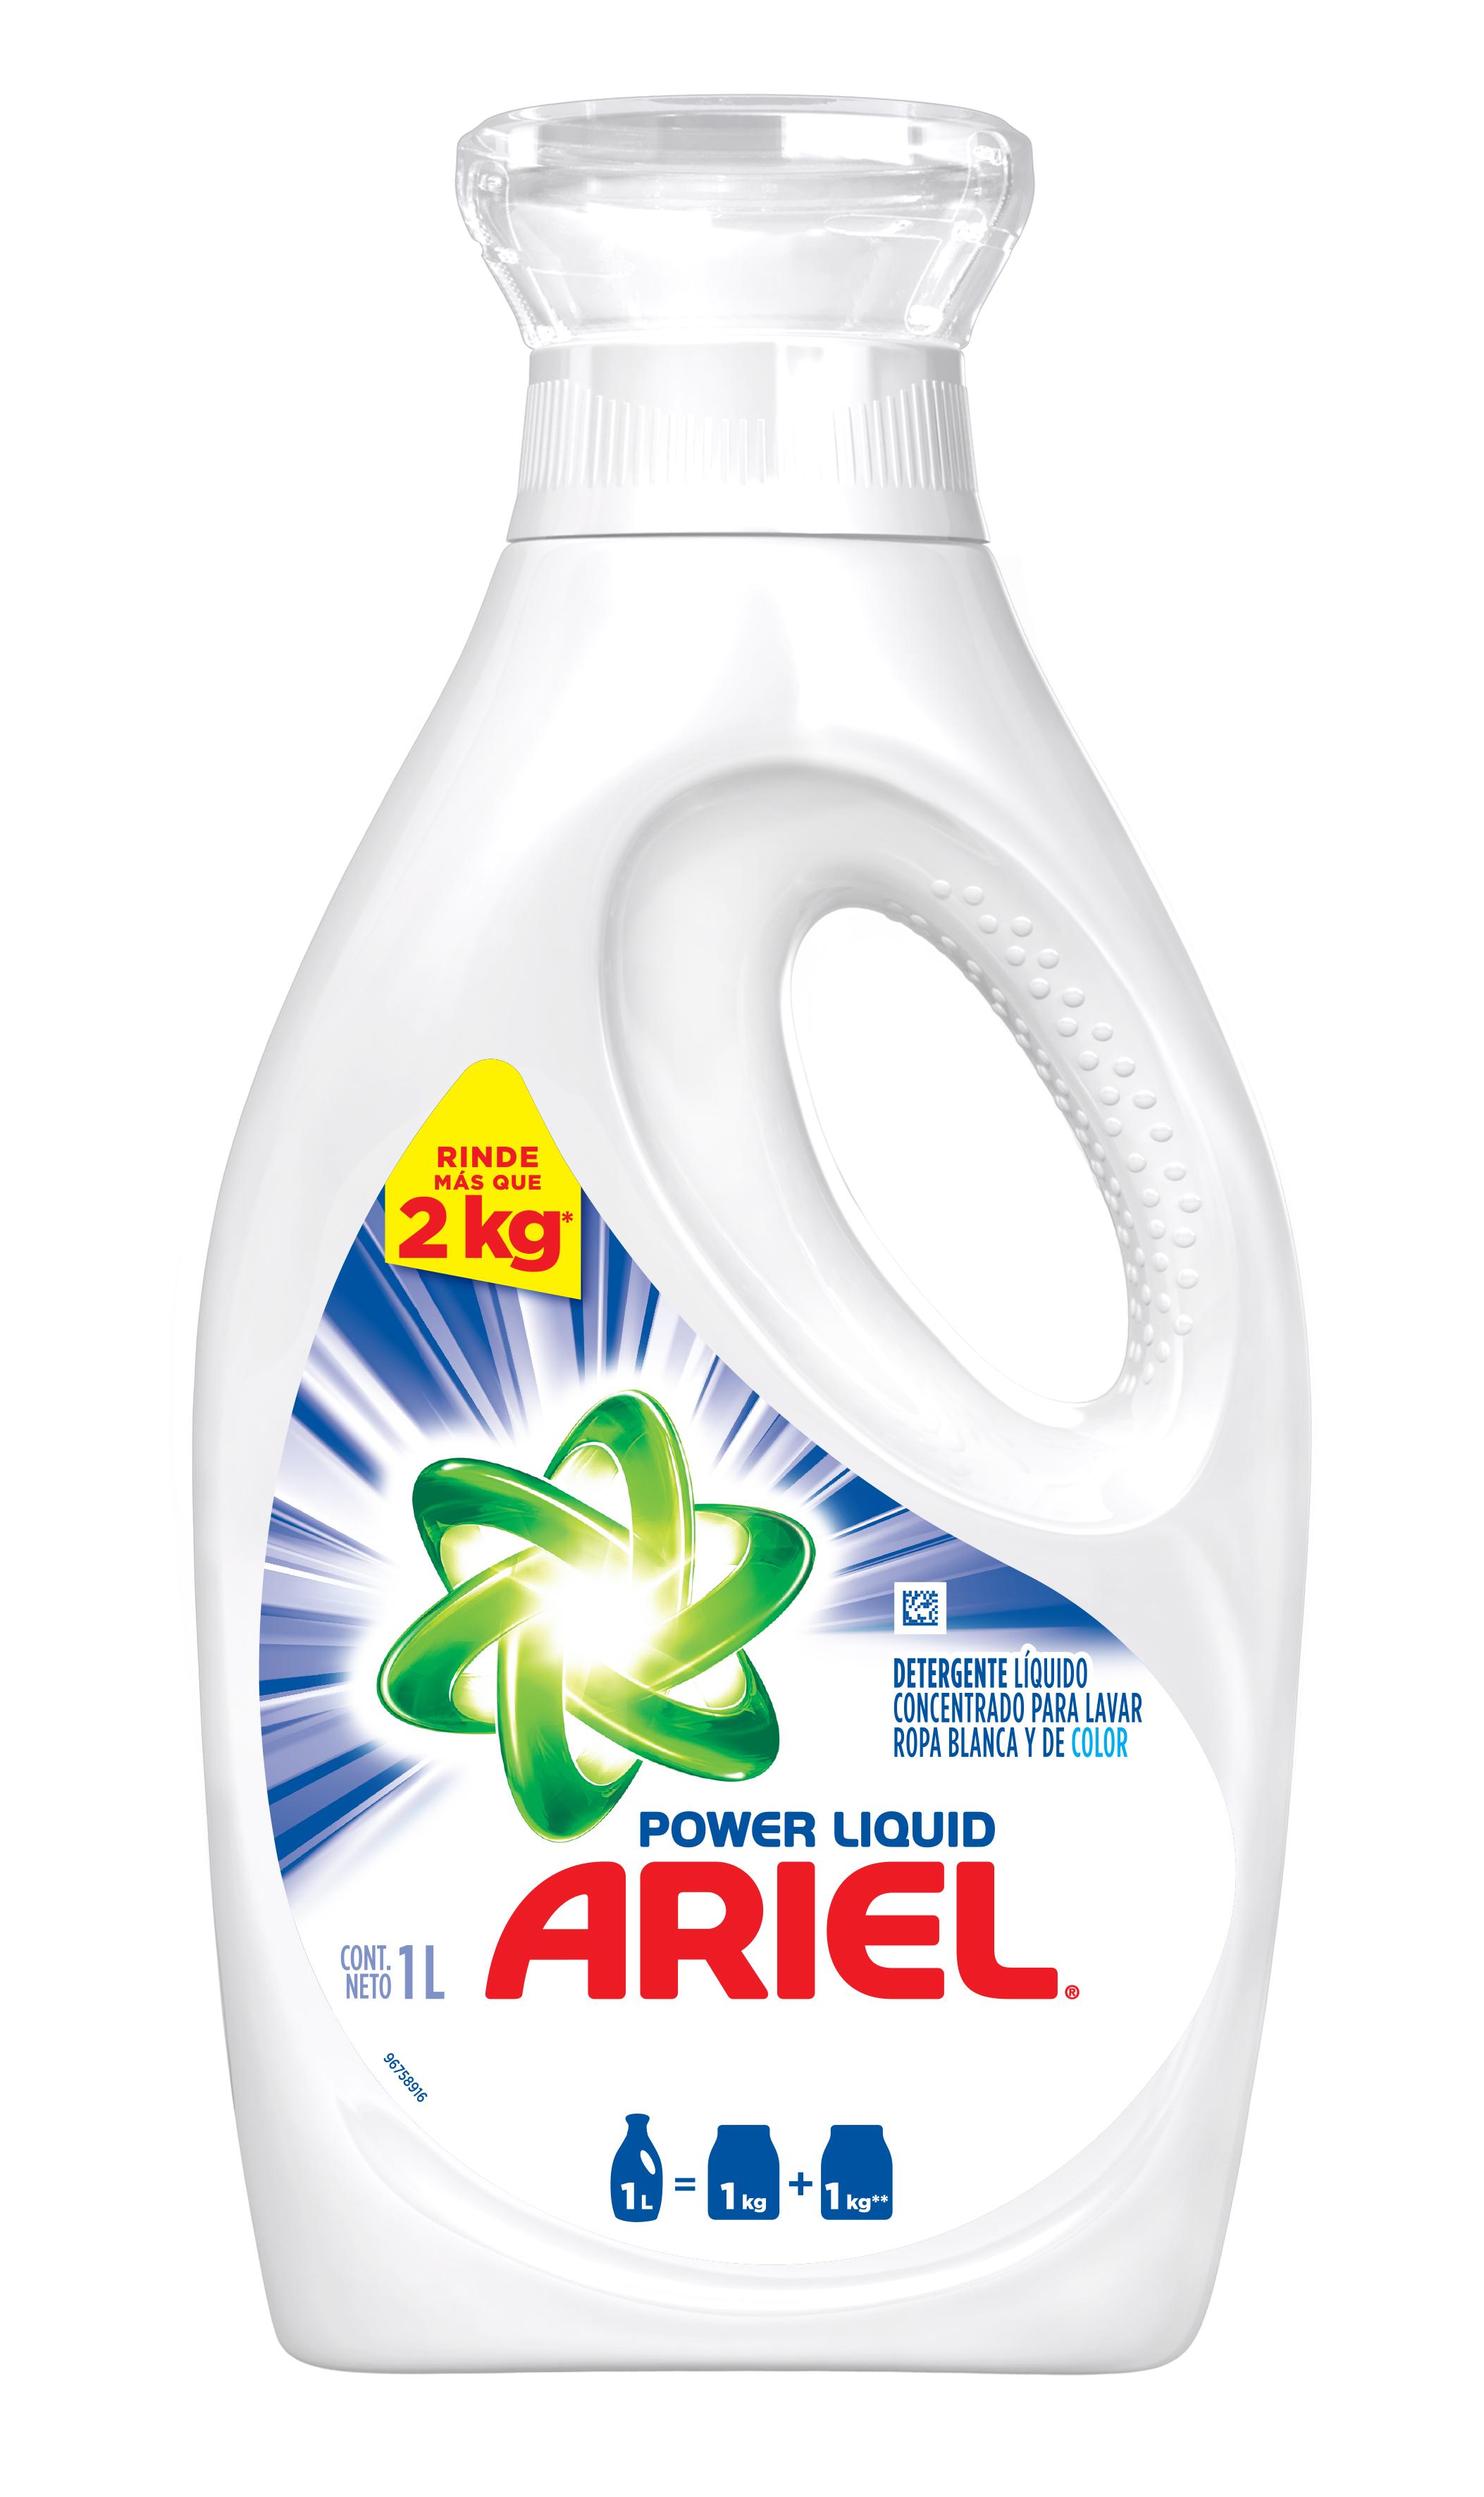 Ariel Power Liquid 1lt